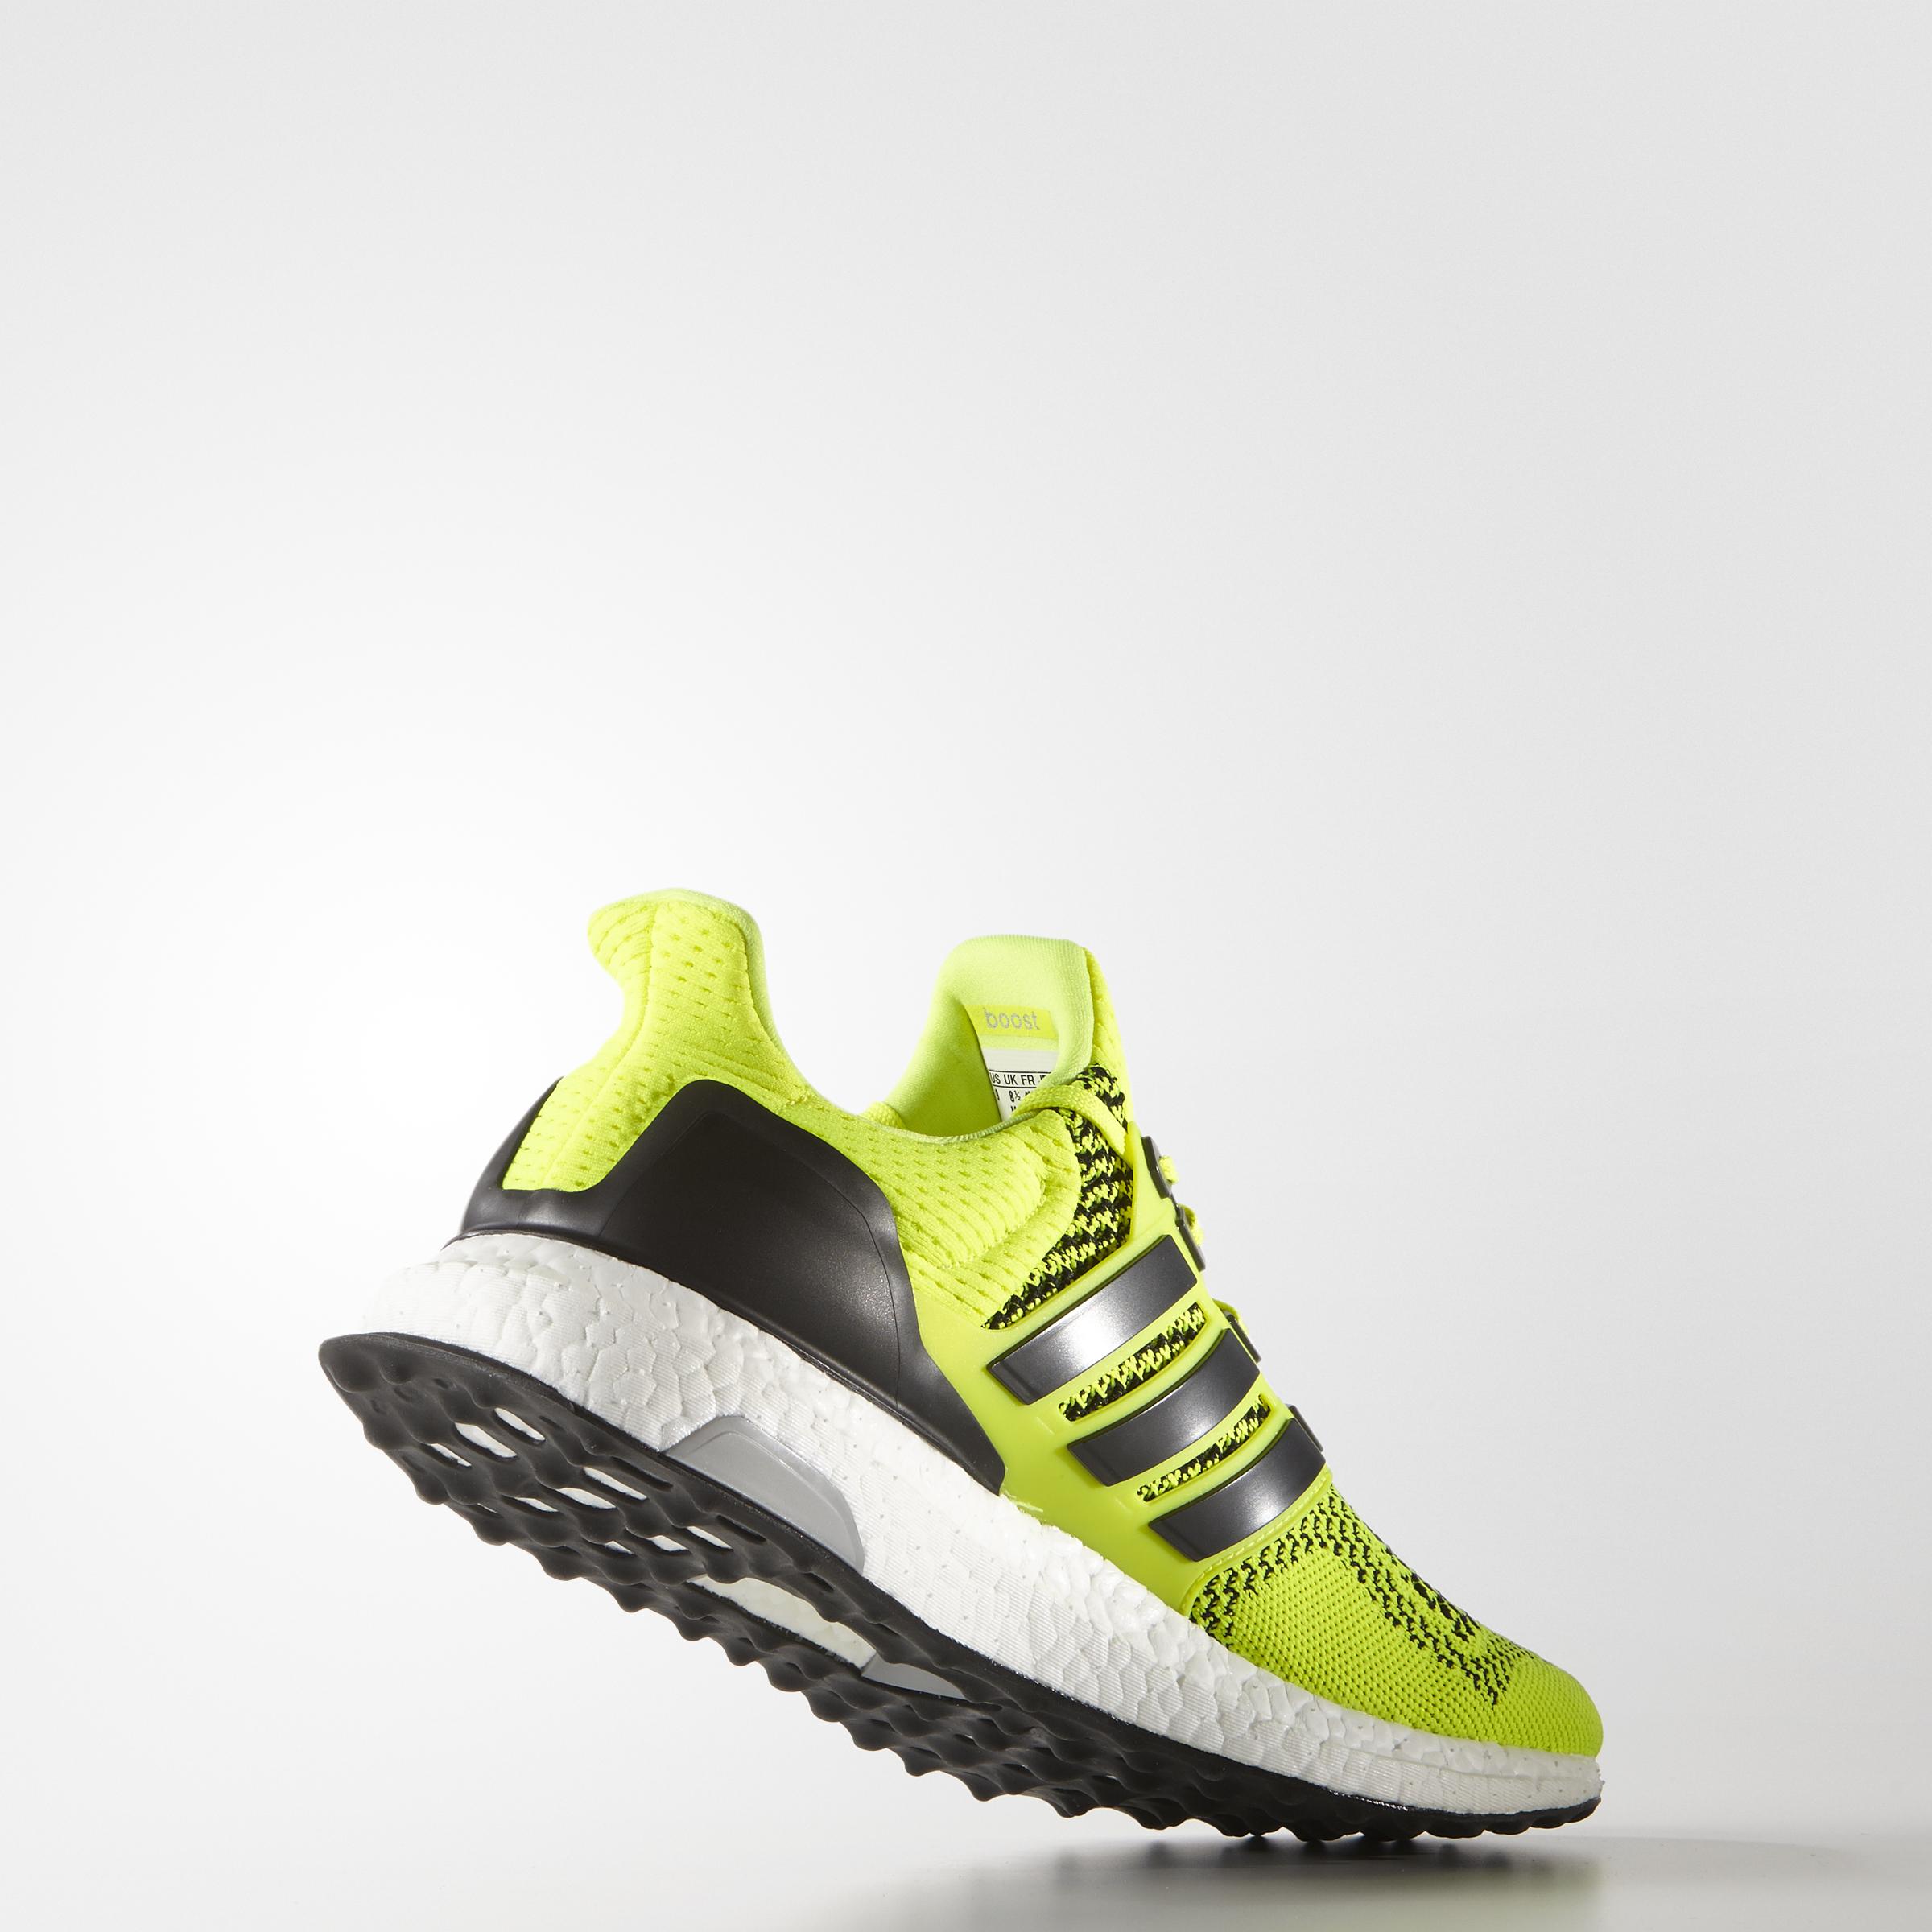 adidas UltraBOOST: солнечные оттенки бега